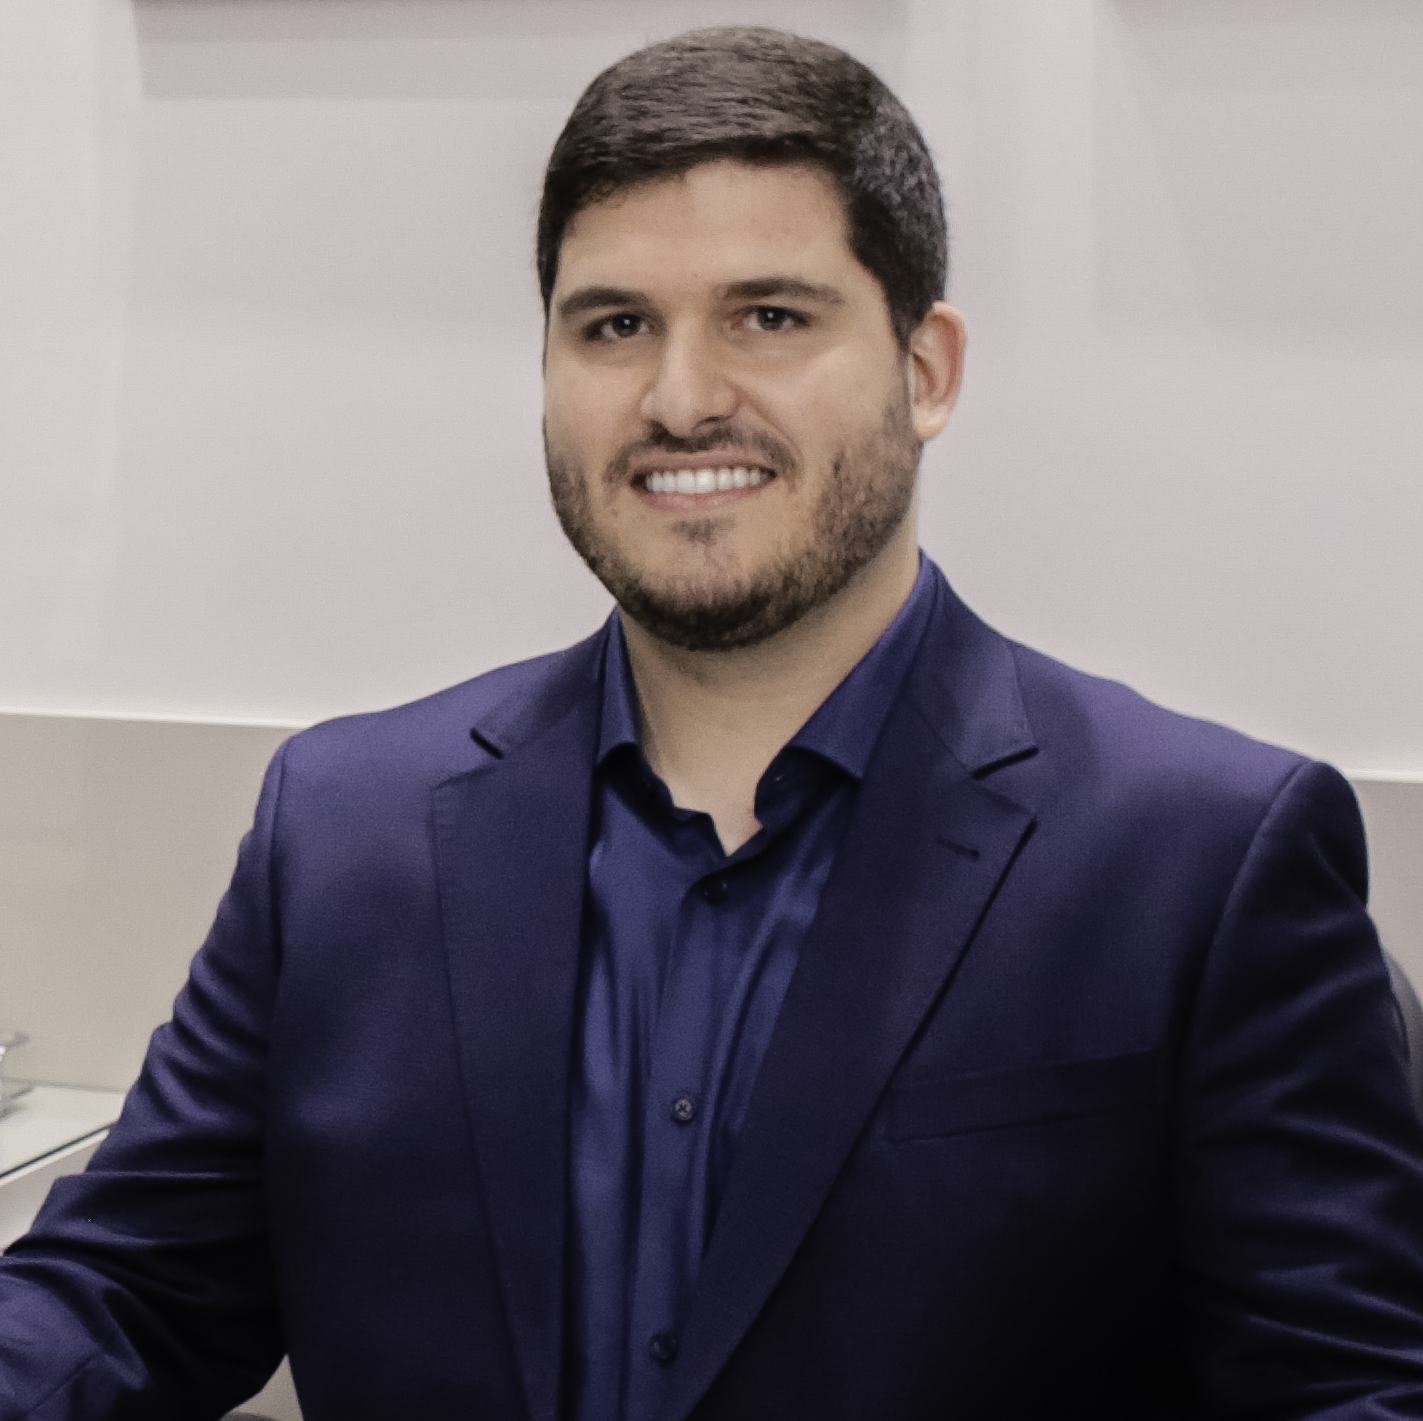 José Teixeira Magalhães Neto